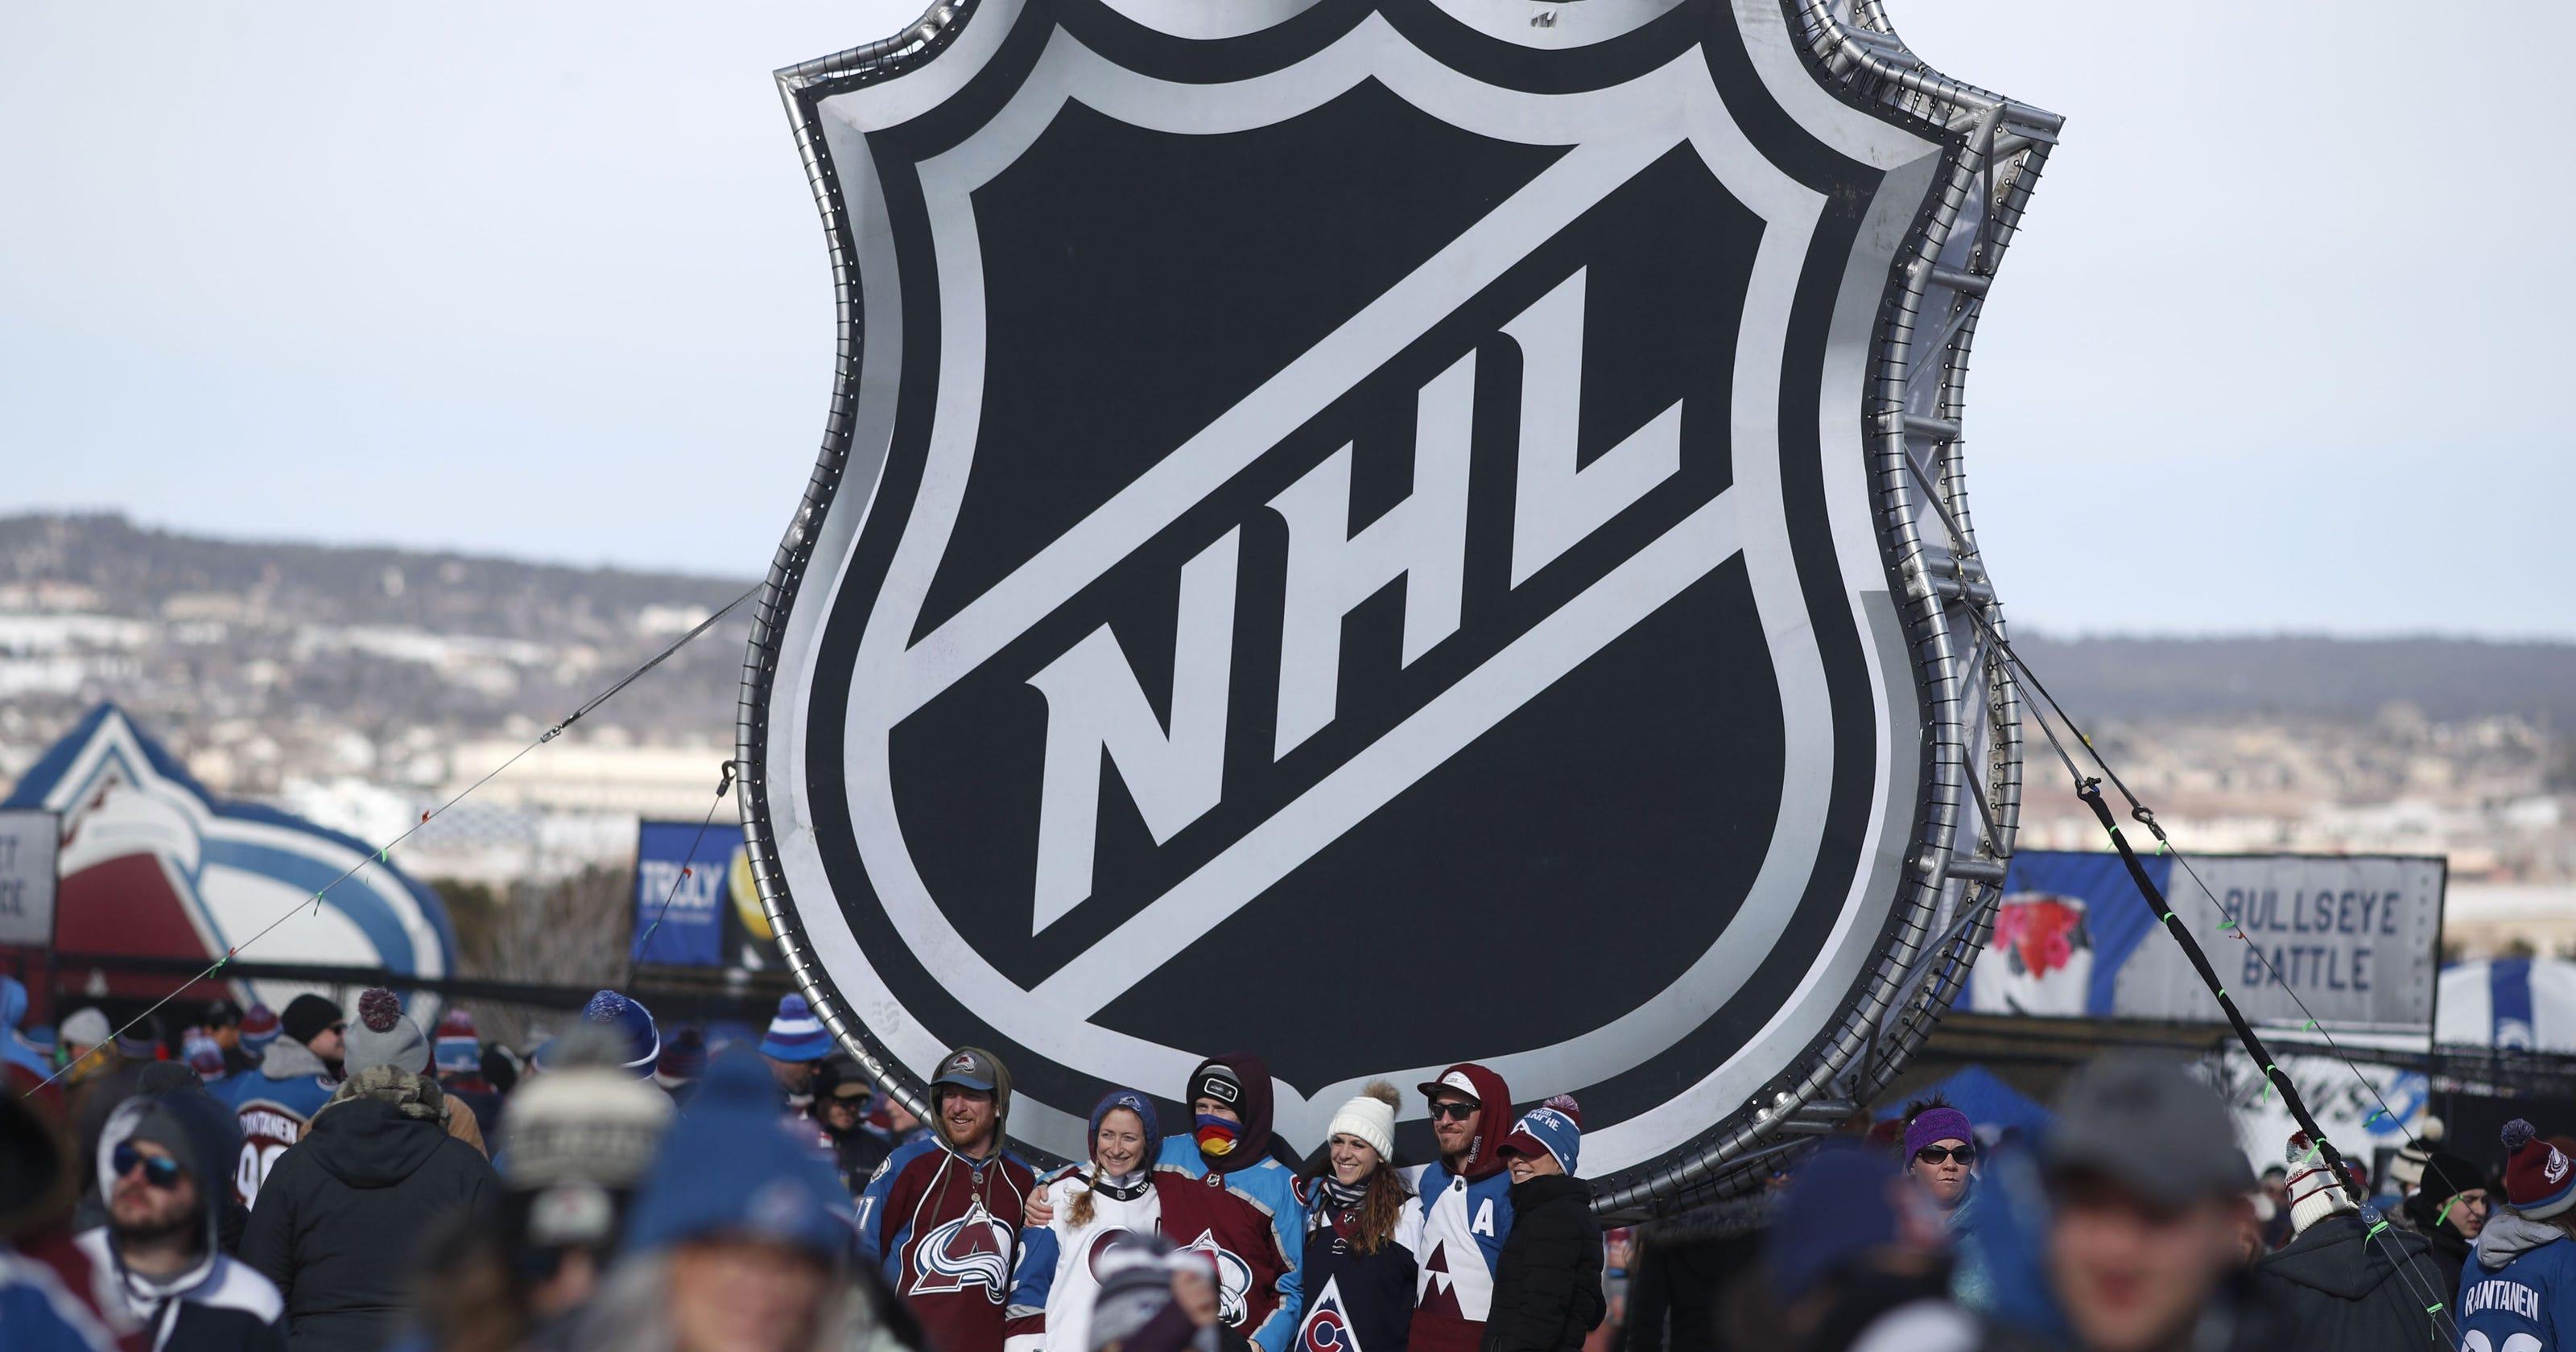 NHL has a plan restart season amid COVID-19, but will it work?